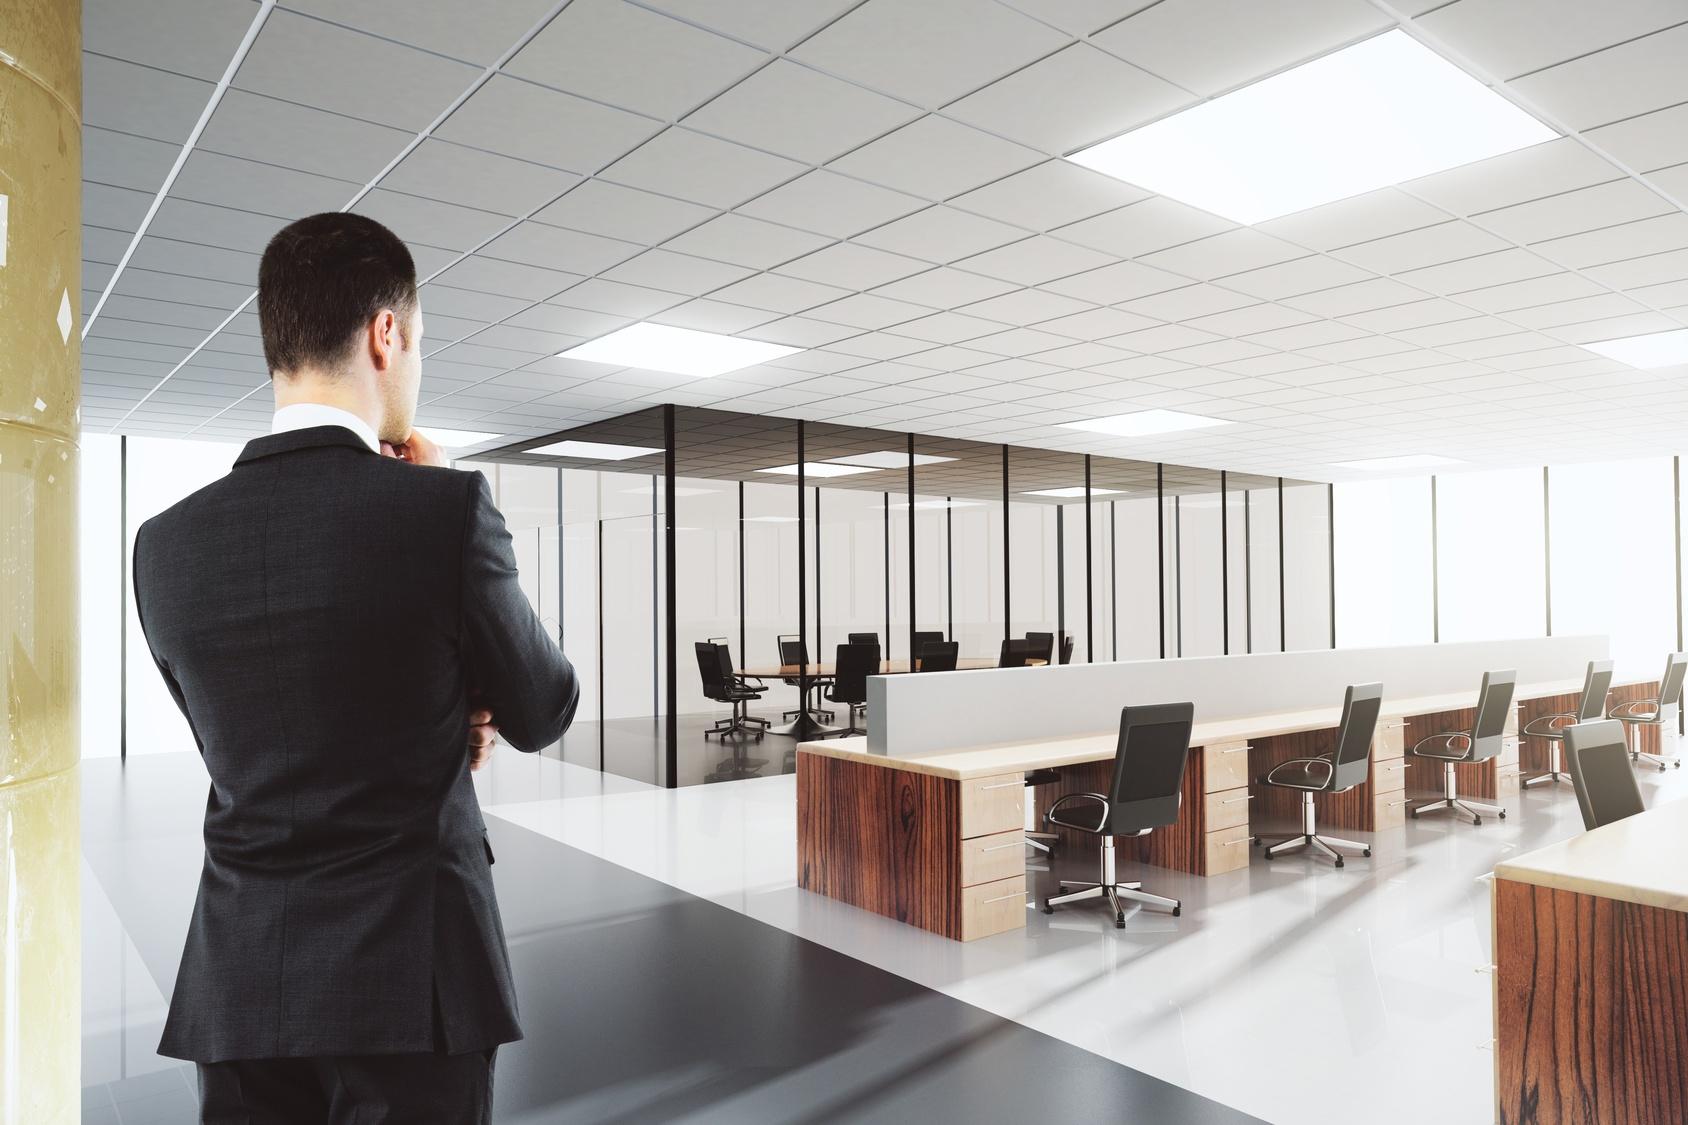 5-tips-for-designing-green-office-building-plans.jpg